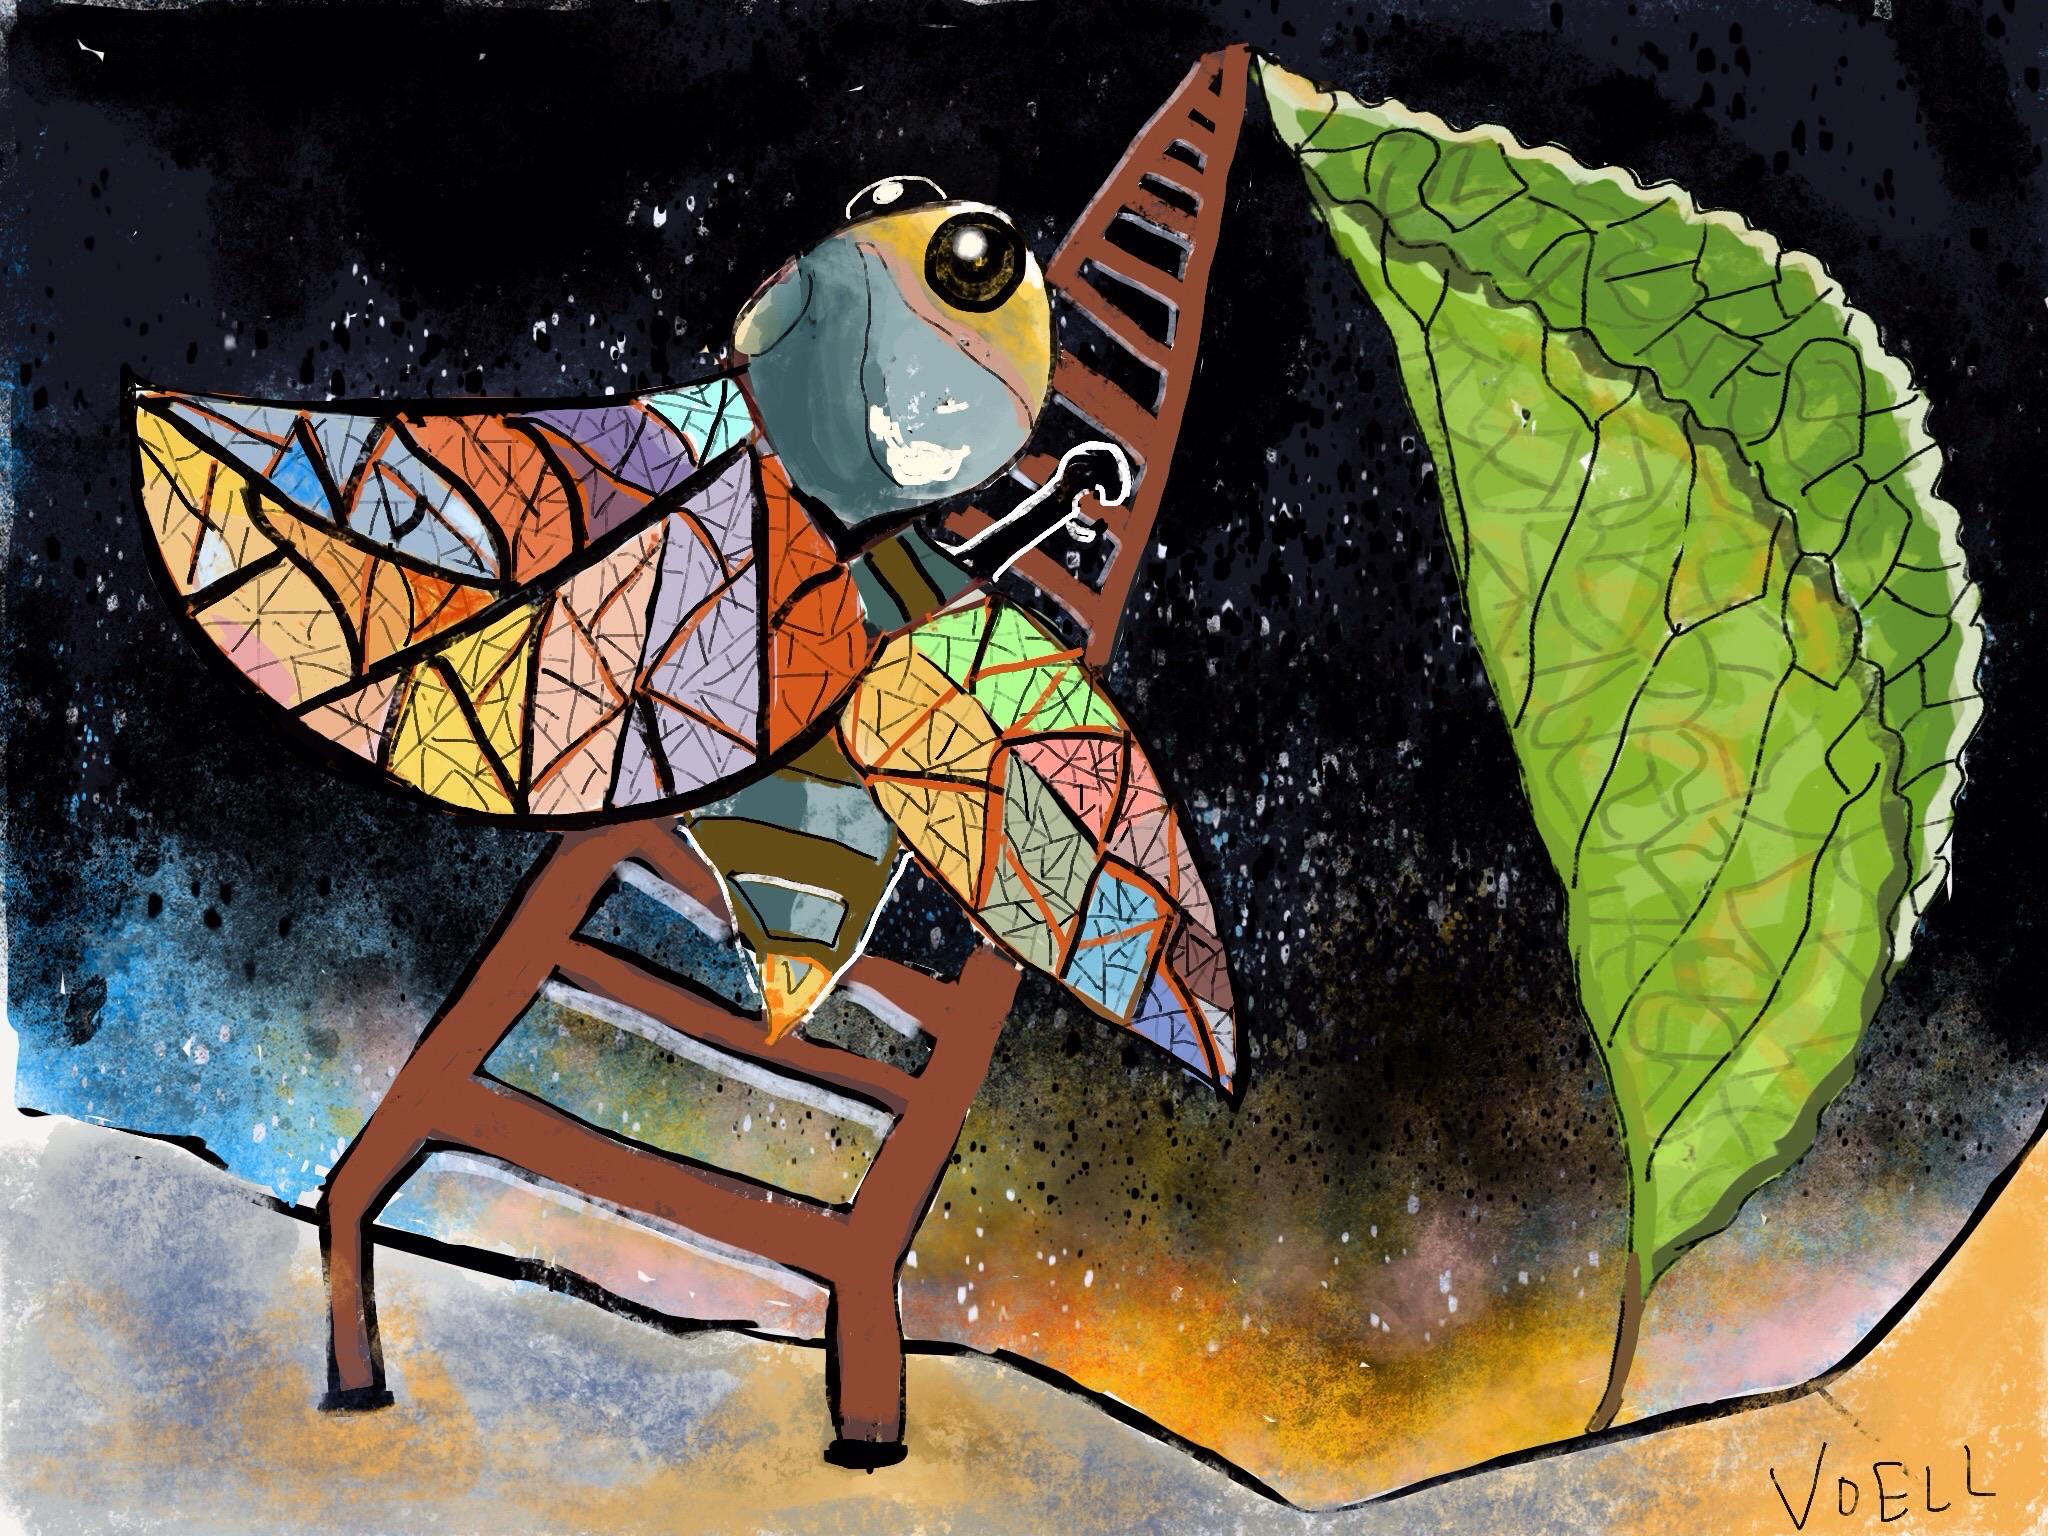 Ladder to the Top of the Leaf -- digital illustration, 2018